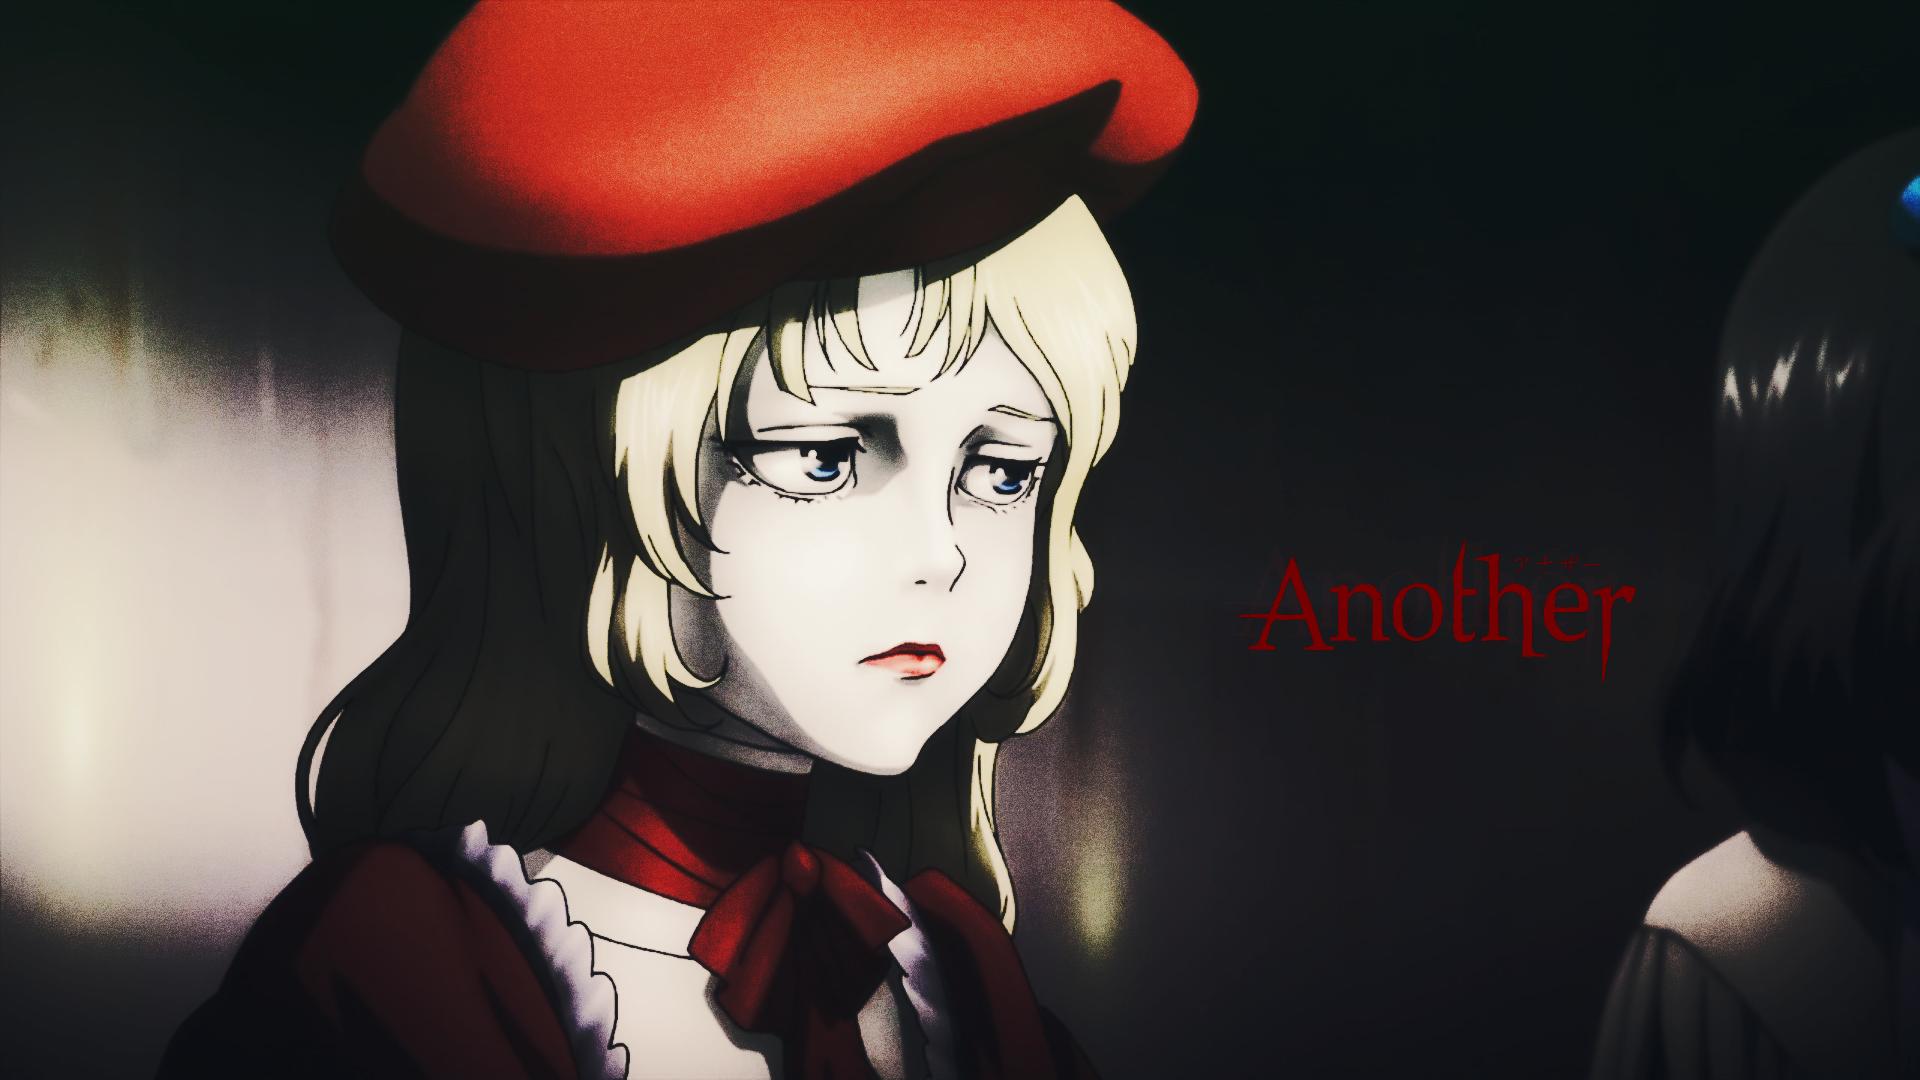 Anime 1920x1080 Another anime girls doll 2D blue eyes long hair blond hair